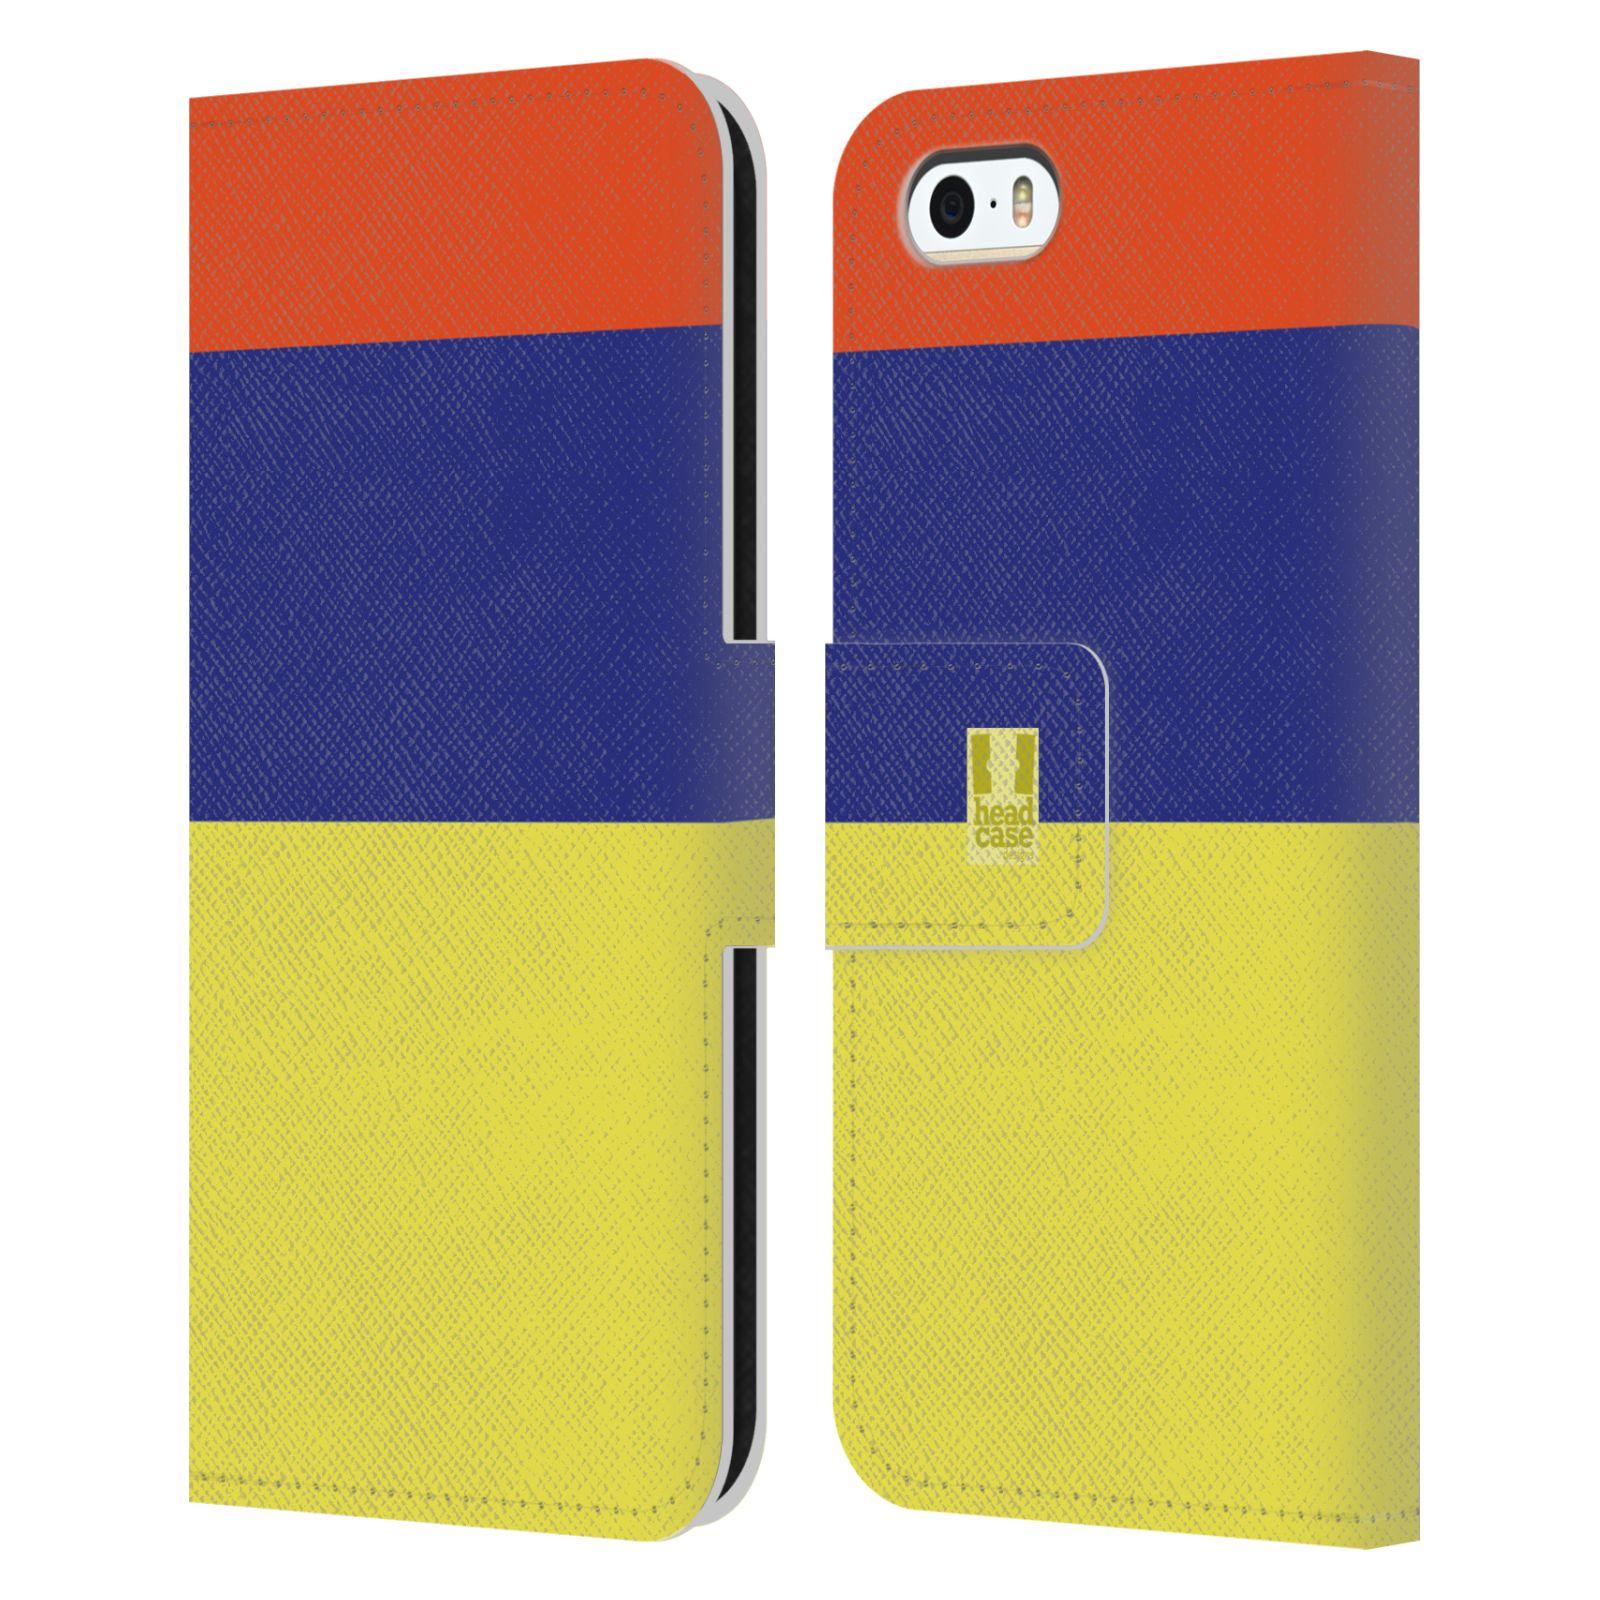 HEAD CASE Flipové pouzdro pro mobil Apple Iphone 5/5S barevné tvary žlutá, modrá, červená